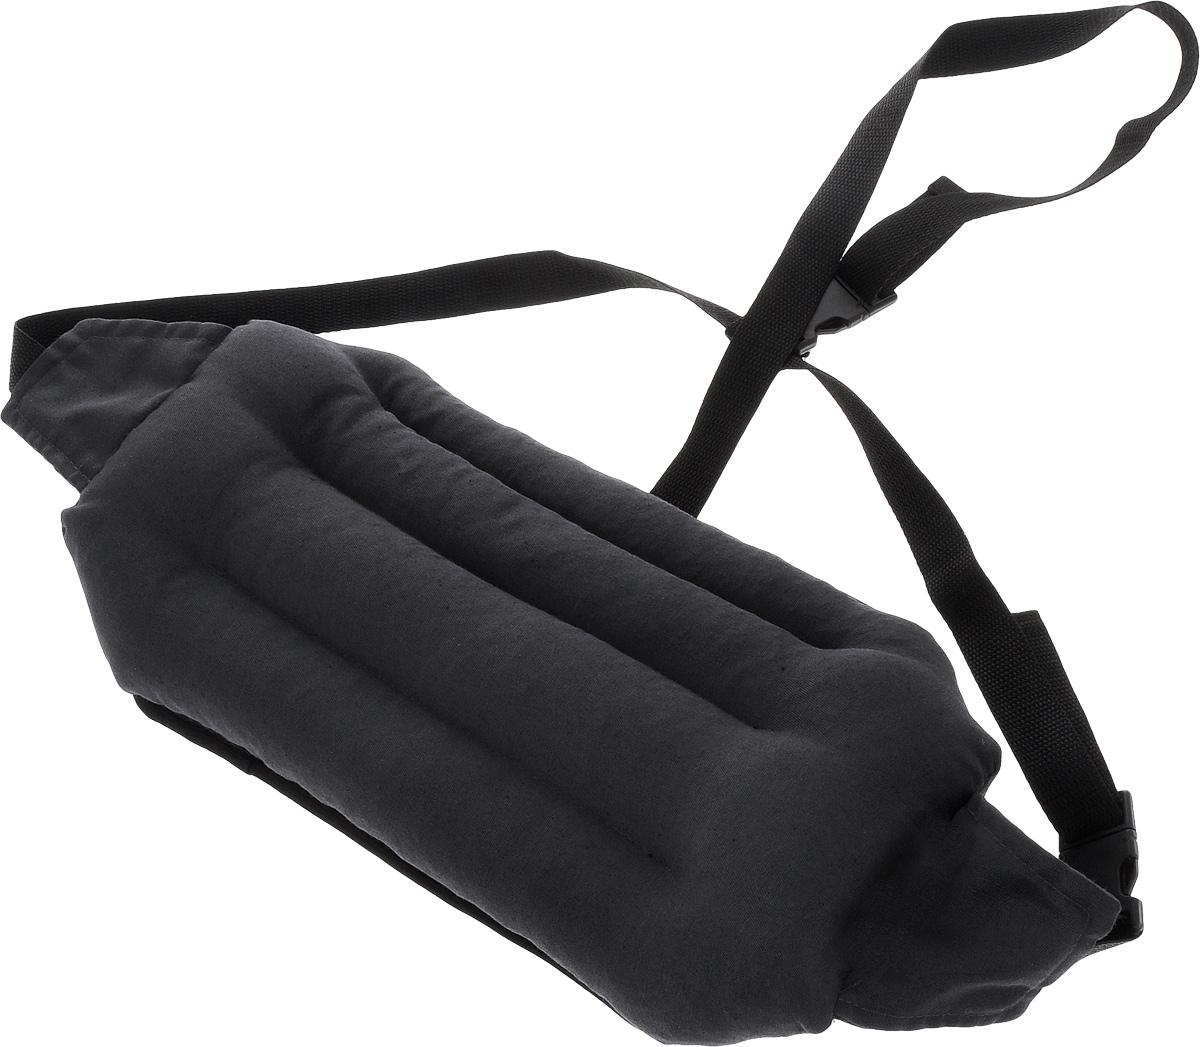 Подушка под спину Smart Textile Офис, наполнитель: лузга гречихи, 40 х 20 см аксессуар подушки на ремень безопасности smart textile автоуют детский совушка